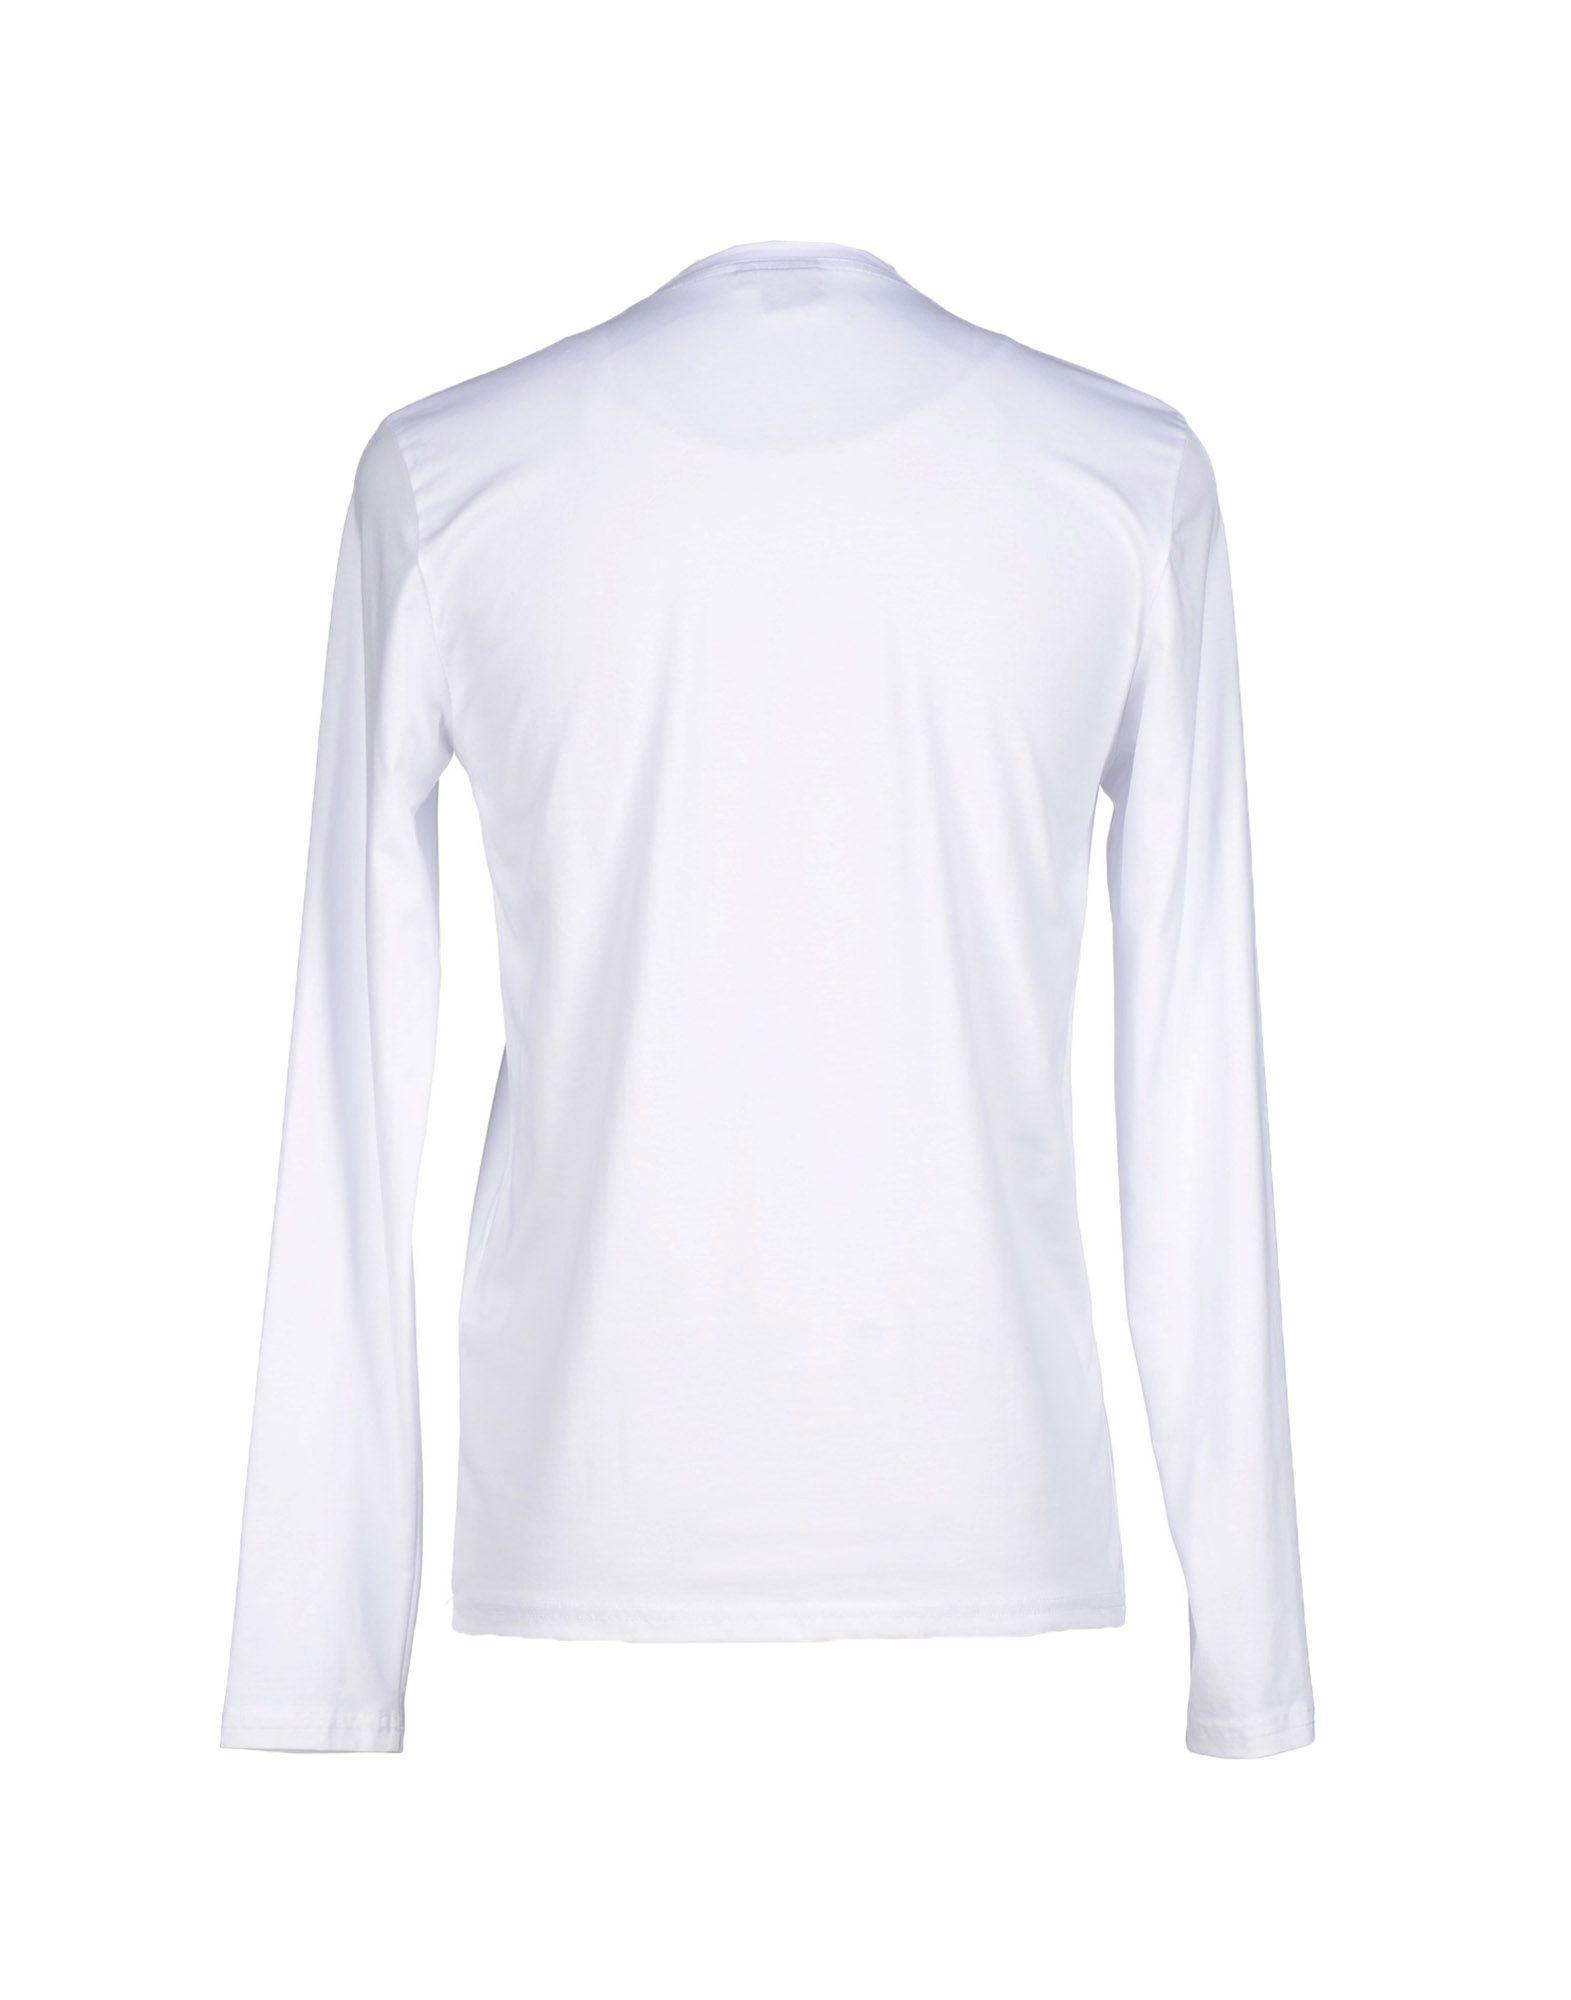 calvin klein t shirt in white for men. Black Bedroom Furniture Sets. Home Design Ideas